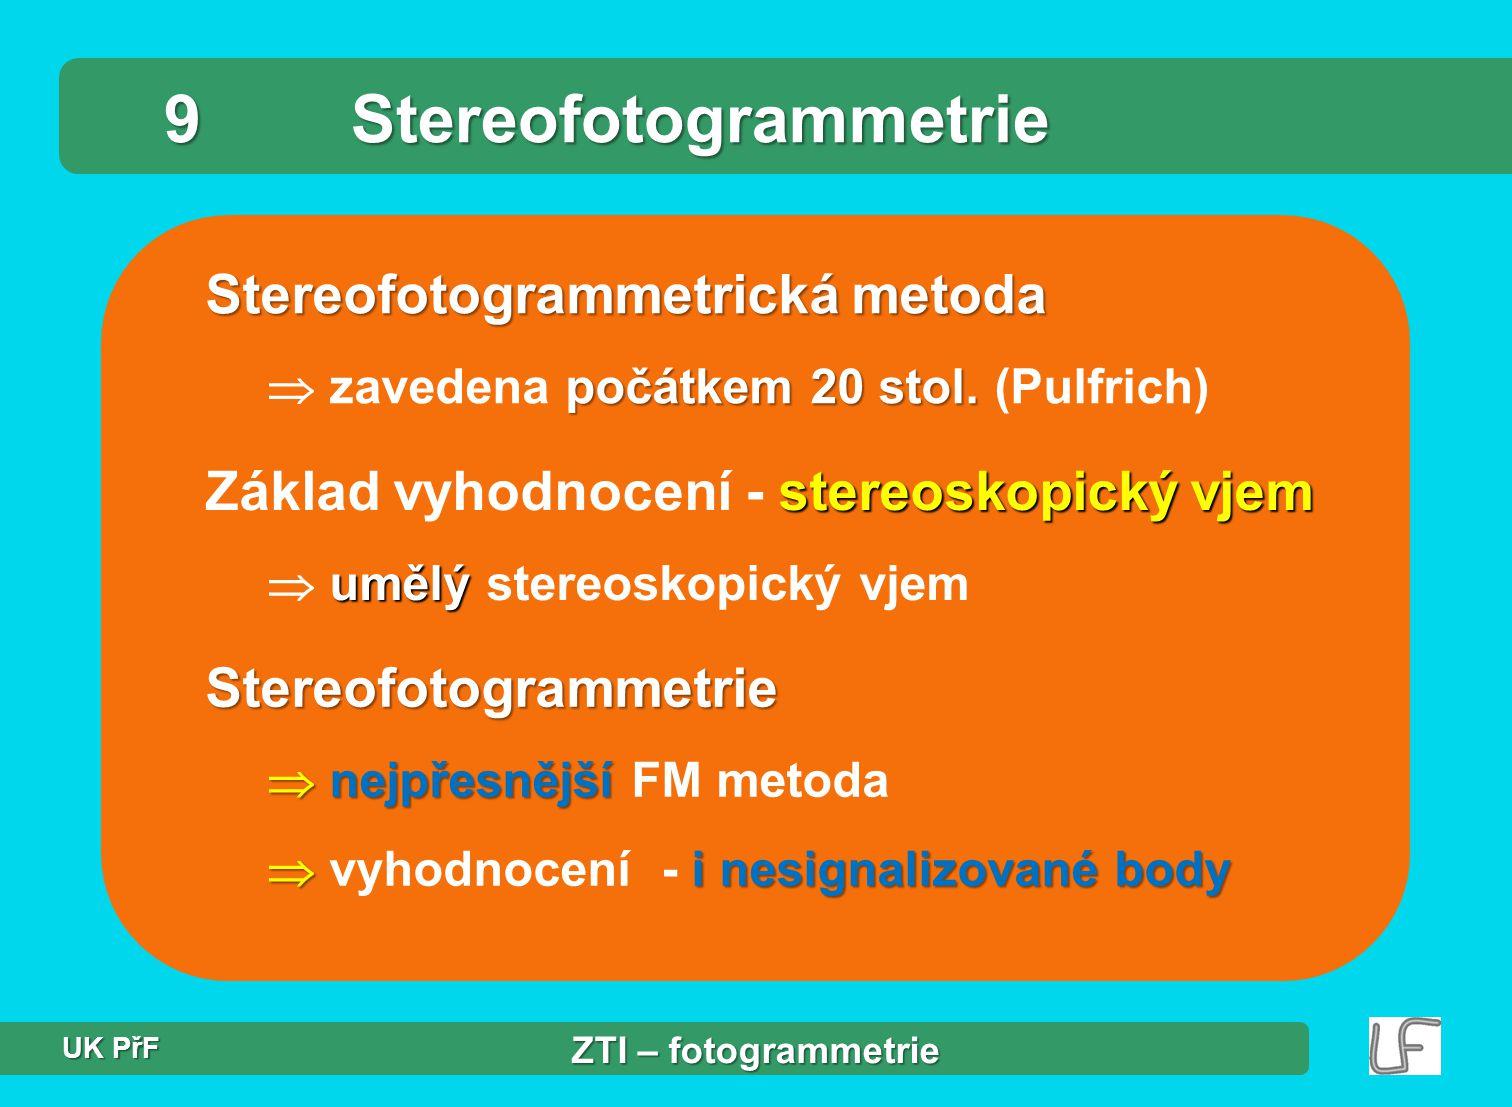 9 Stereofotogrammetrie